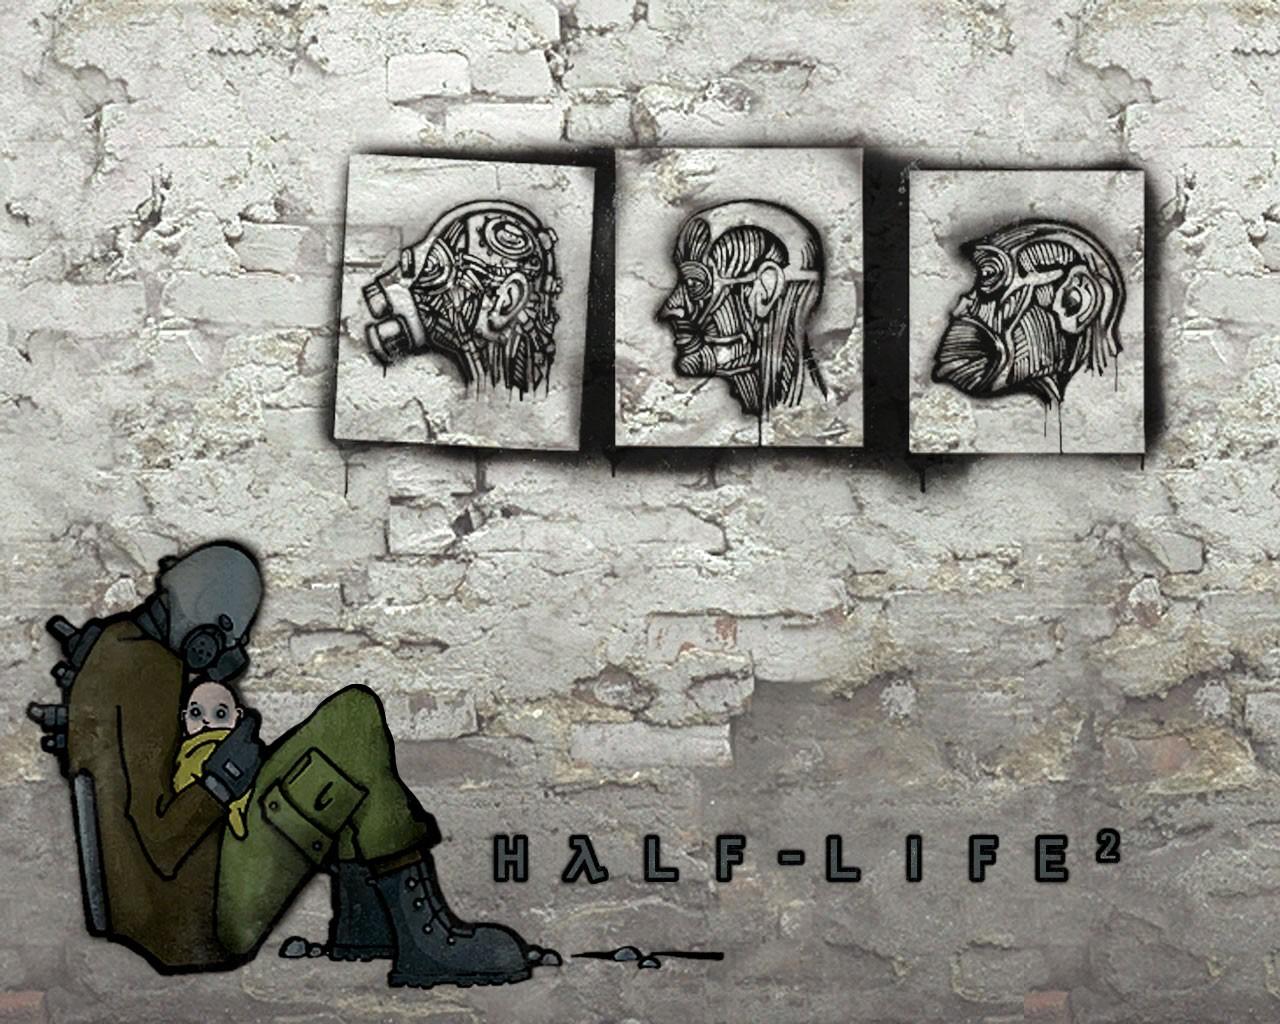 58a - Half-Life 2 альянс, го, графити